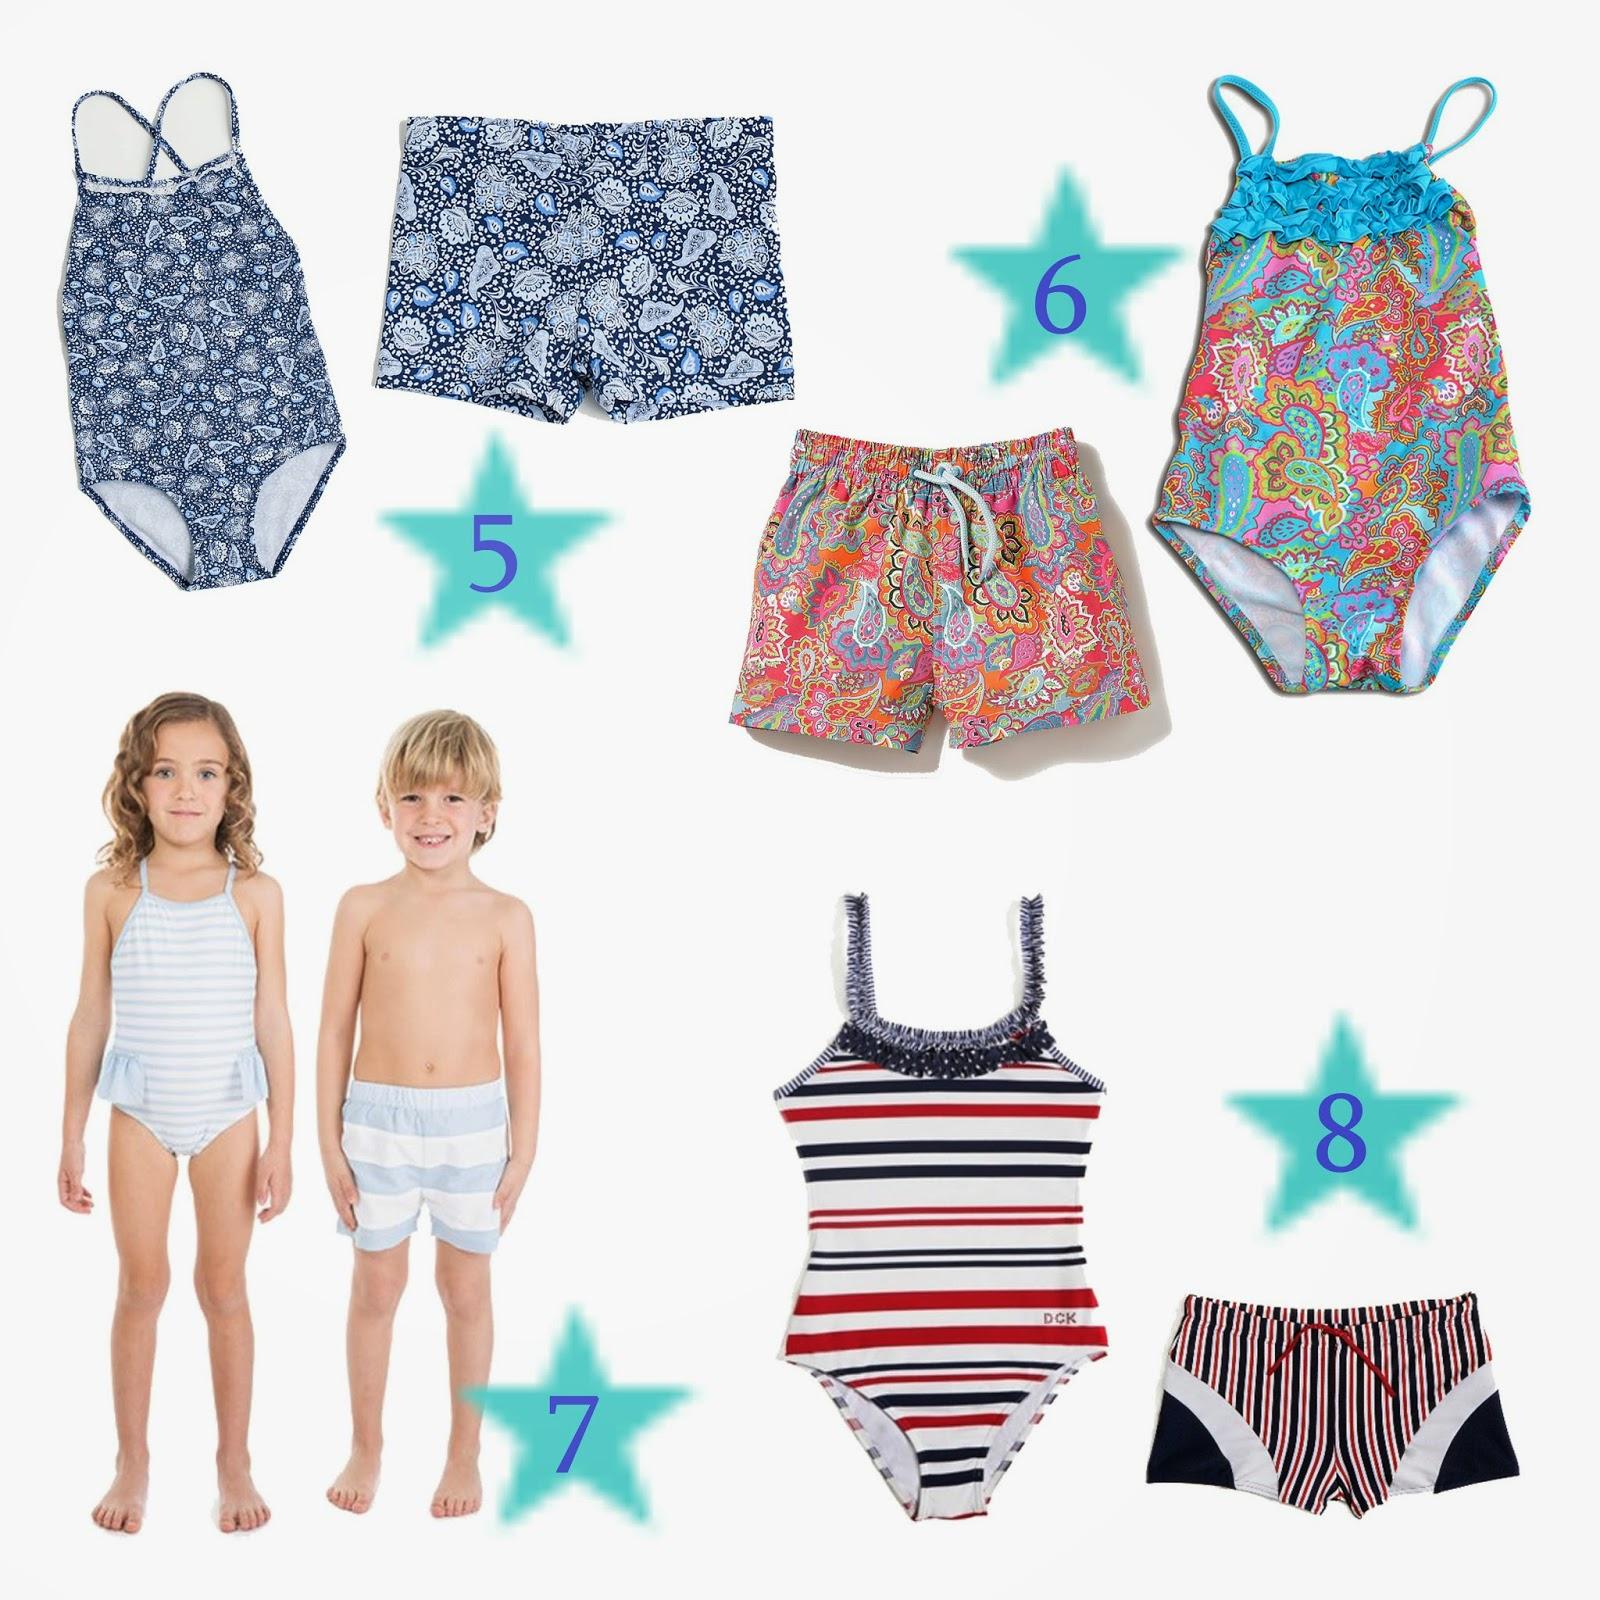 photo-kids-swimsuits-bañadores-2014-zara-byb-gocco-dolores_cortes